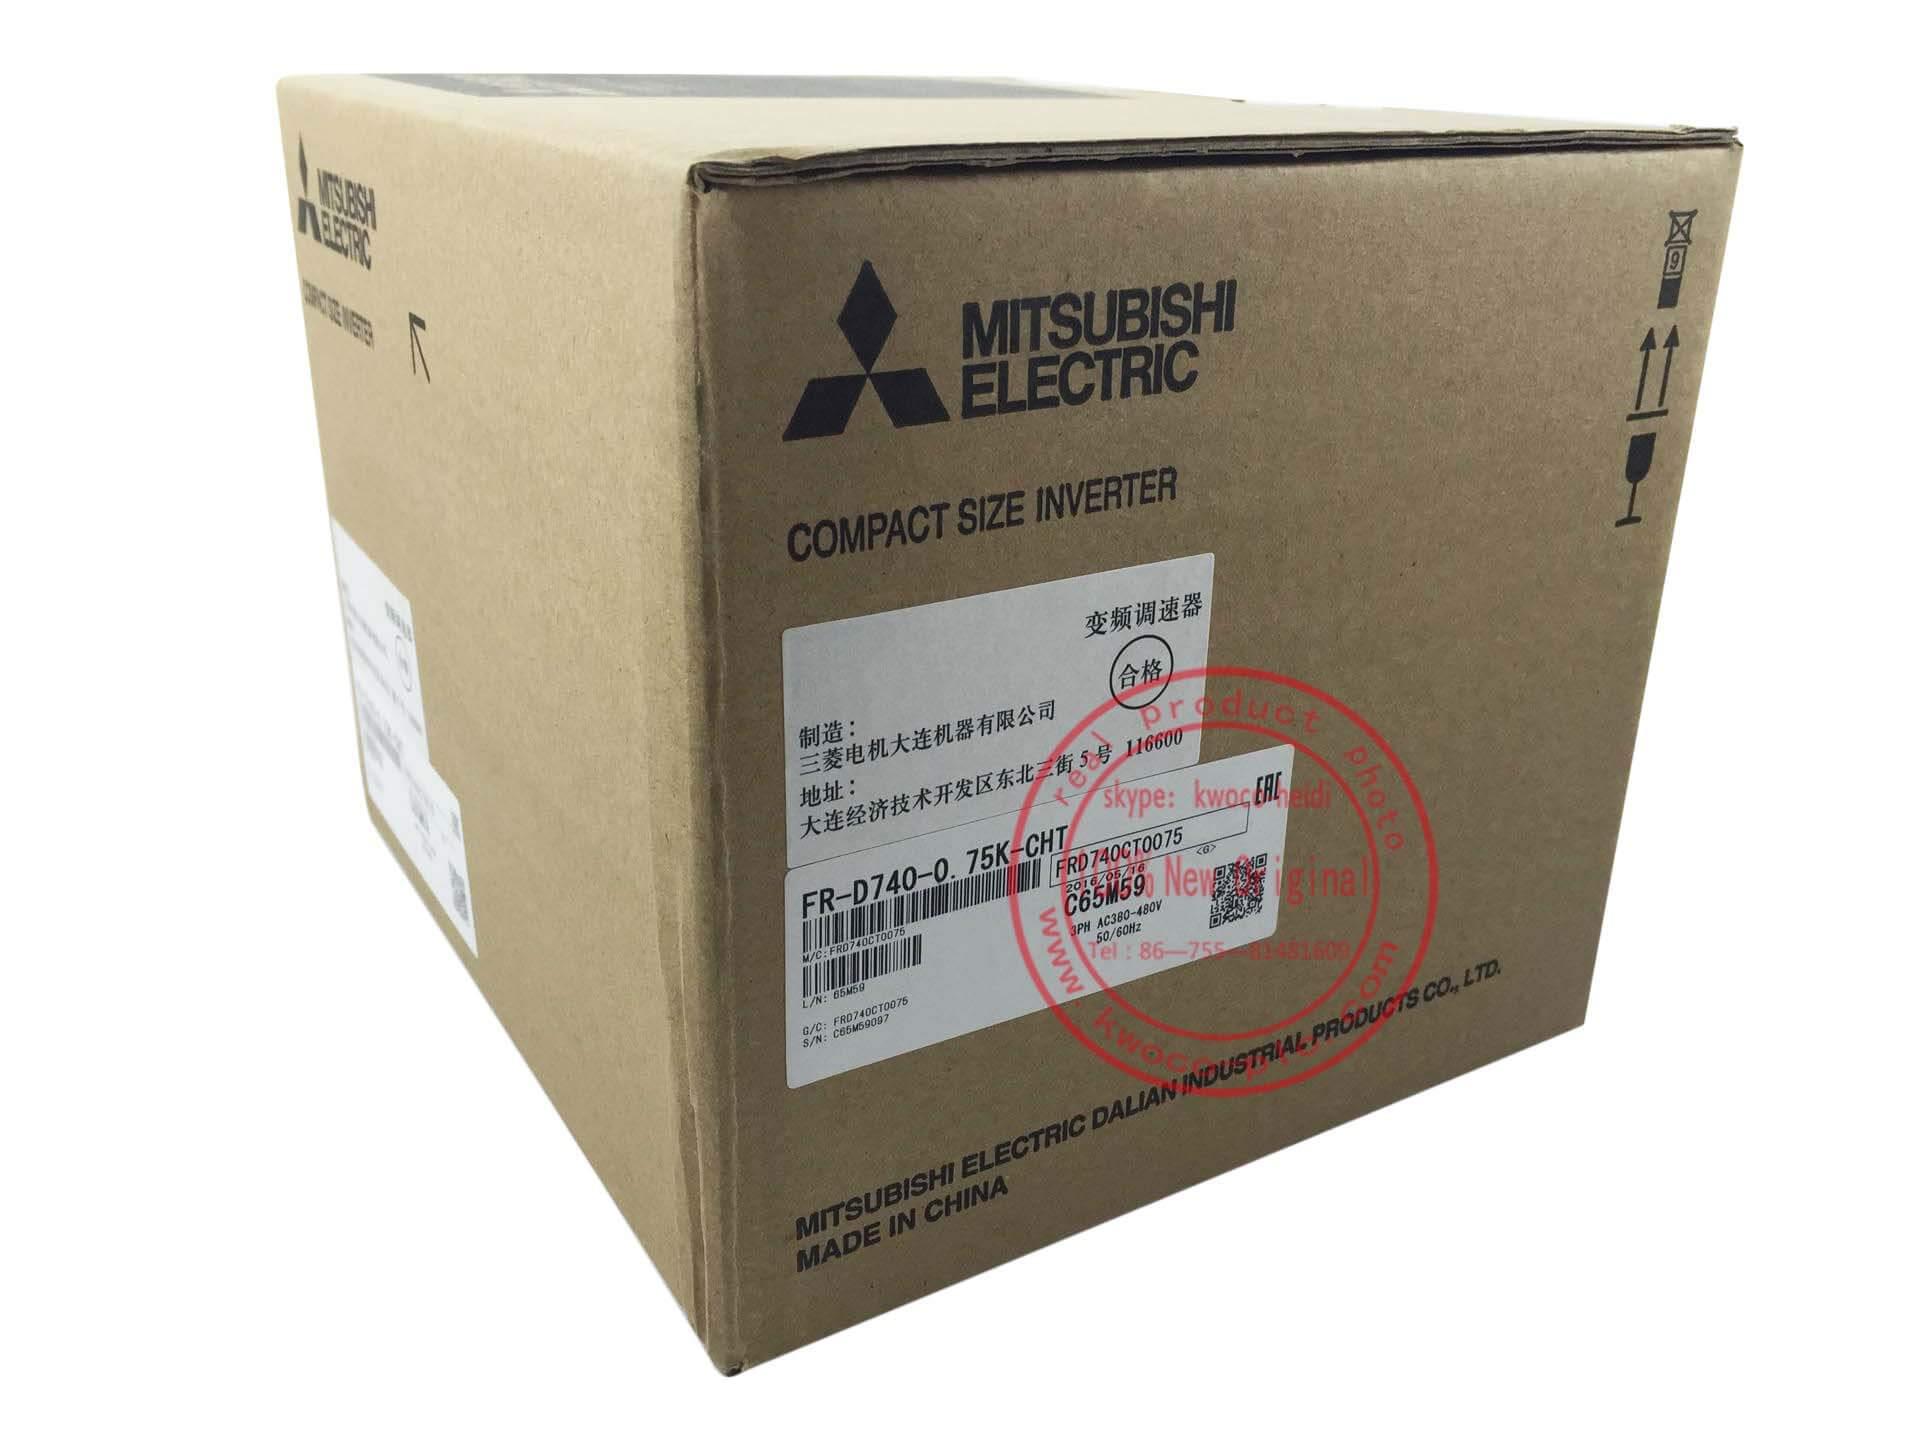 super my conditioners mitsubishi cond conditional slim plasma msy mr air indoor conditioner sharp inverter mit deluxe